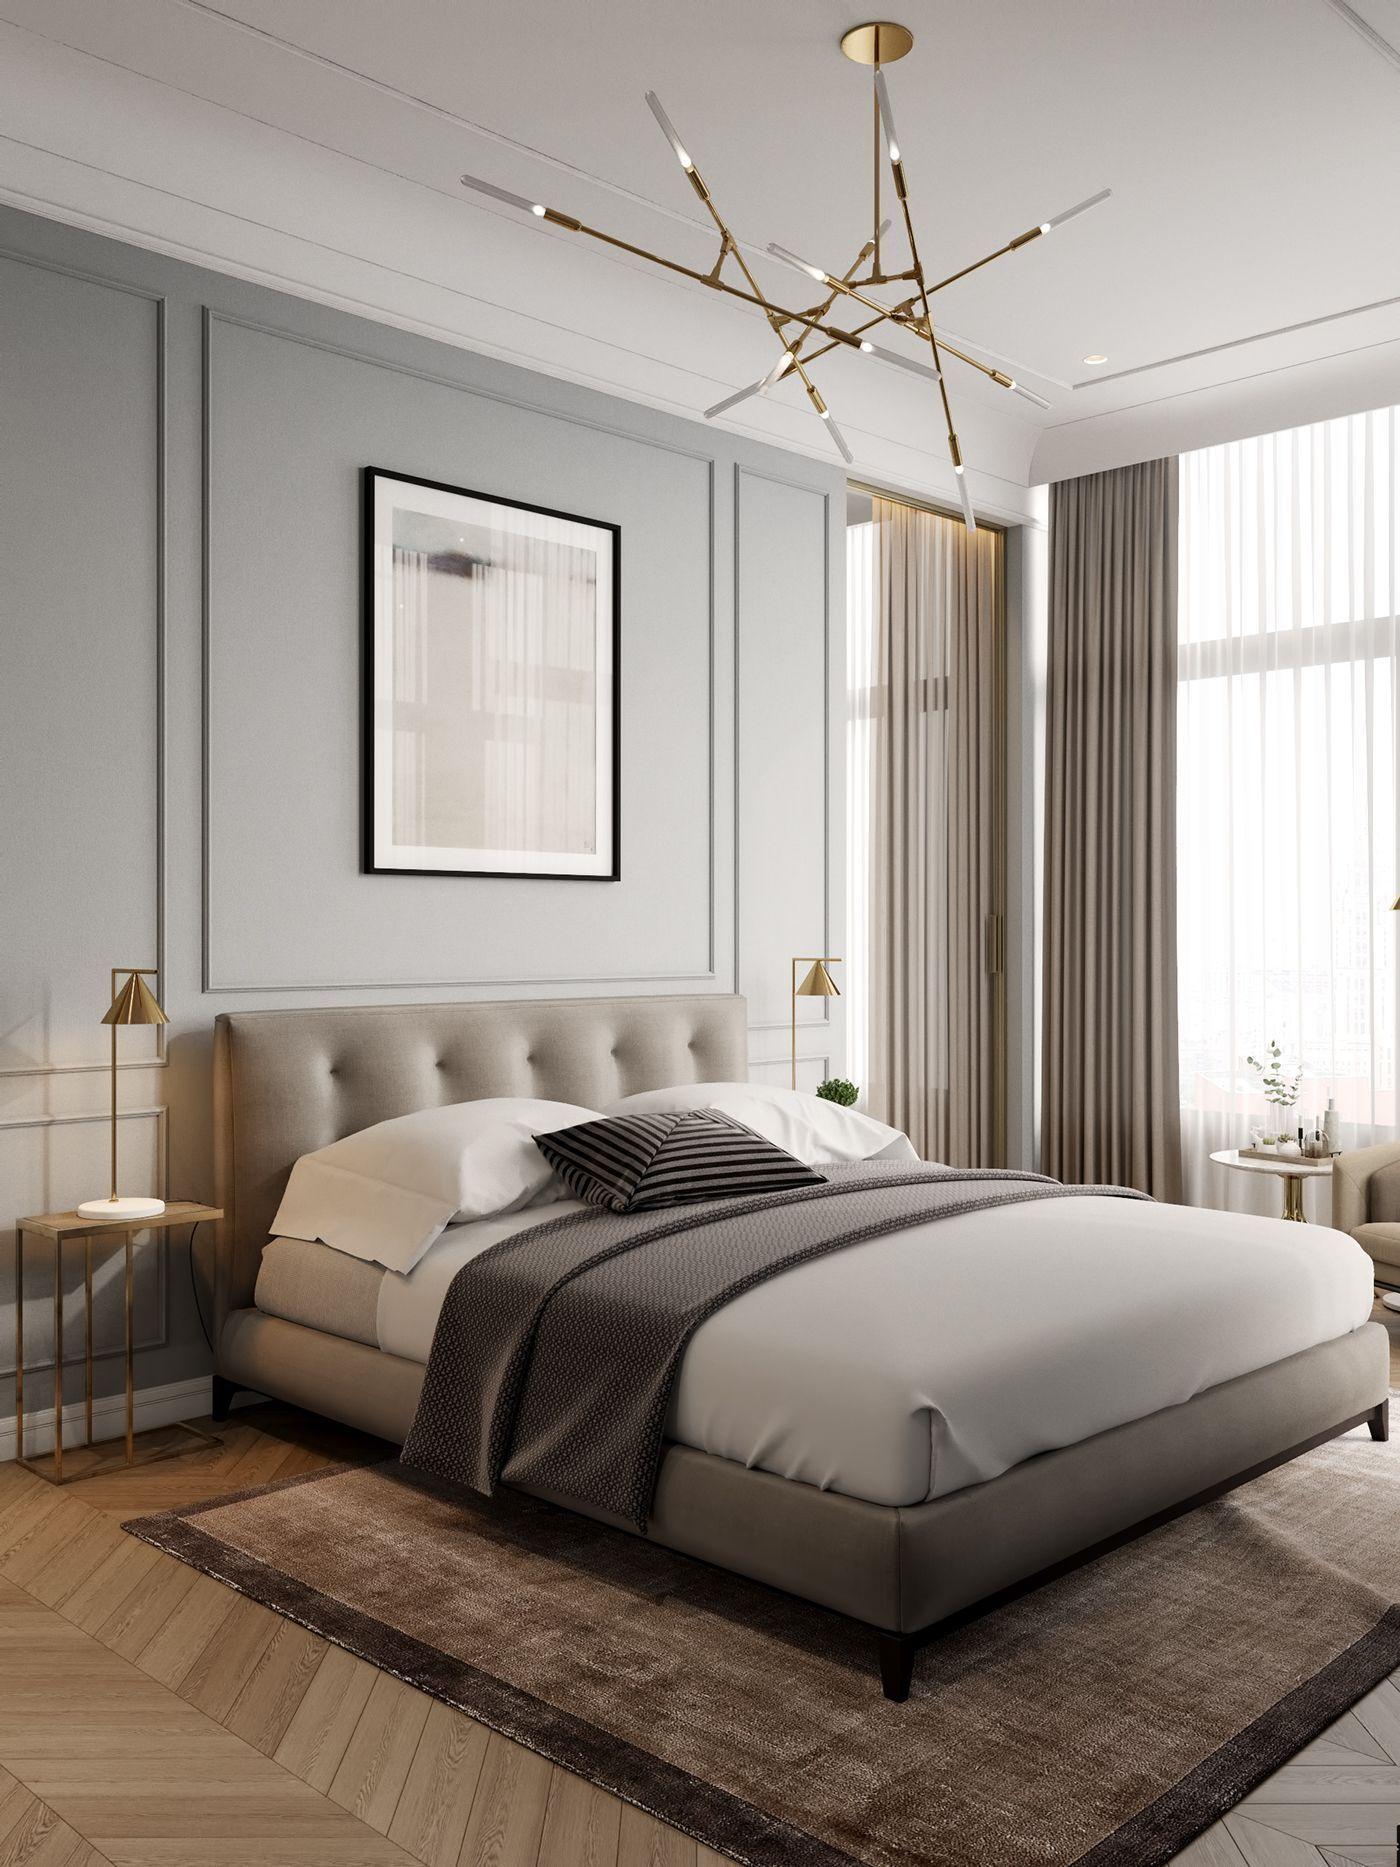 41 Amazing Contemporary Interior Design 2019 In 2020 Contemporary Bedroom Design Contemporary Bedroom Luxurious Bedrooms